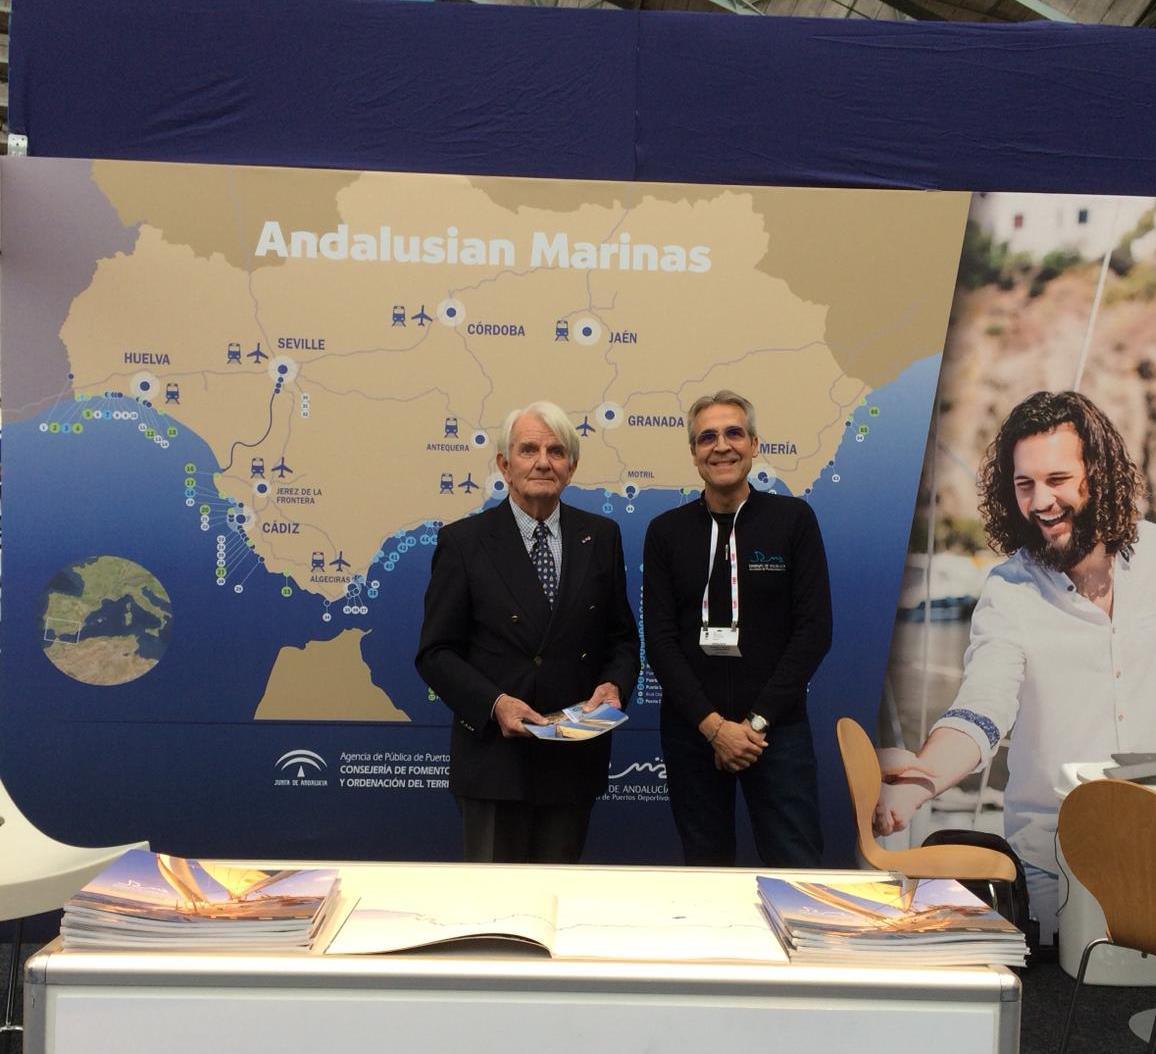 Manuel Raigon, managing director Marinas del Mediterraneo, with a navigator interested in the exhibitor